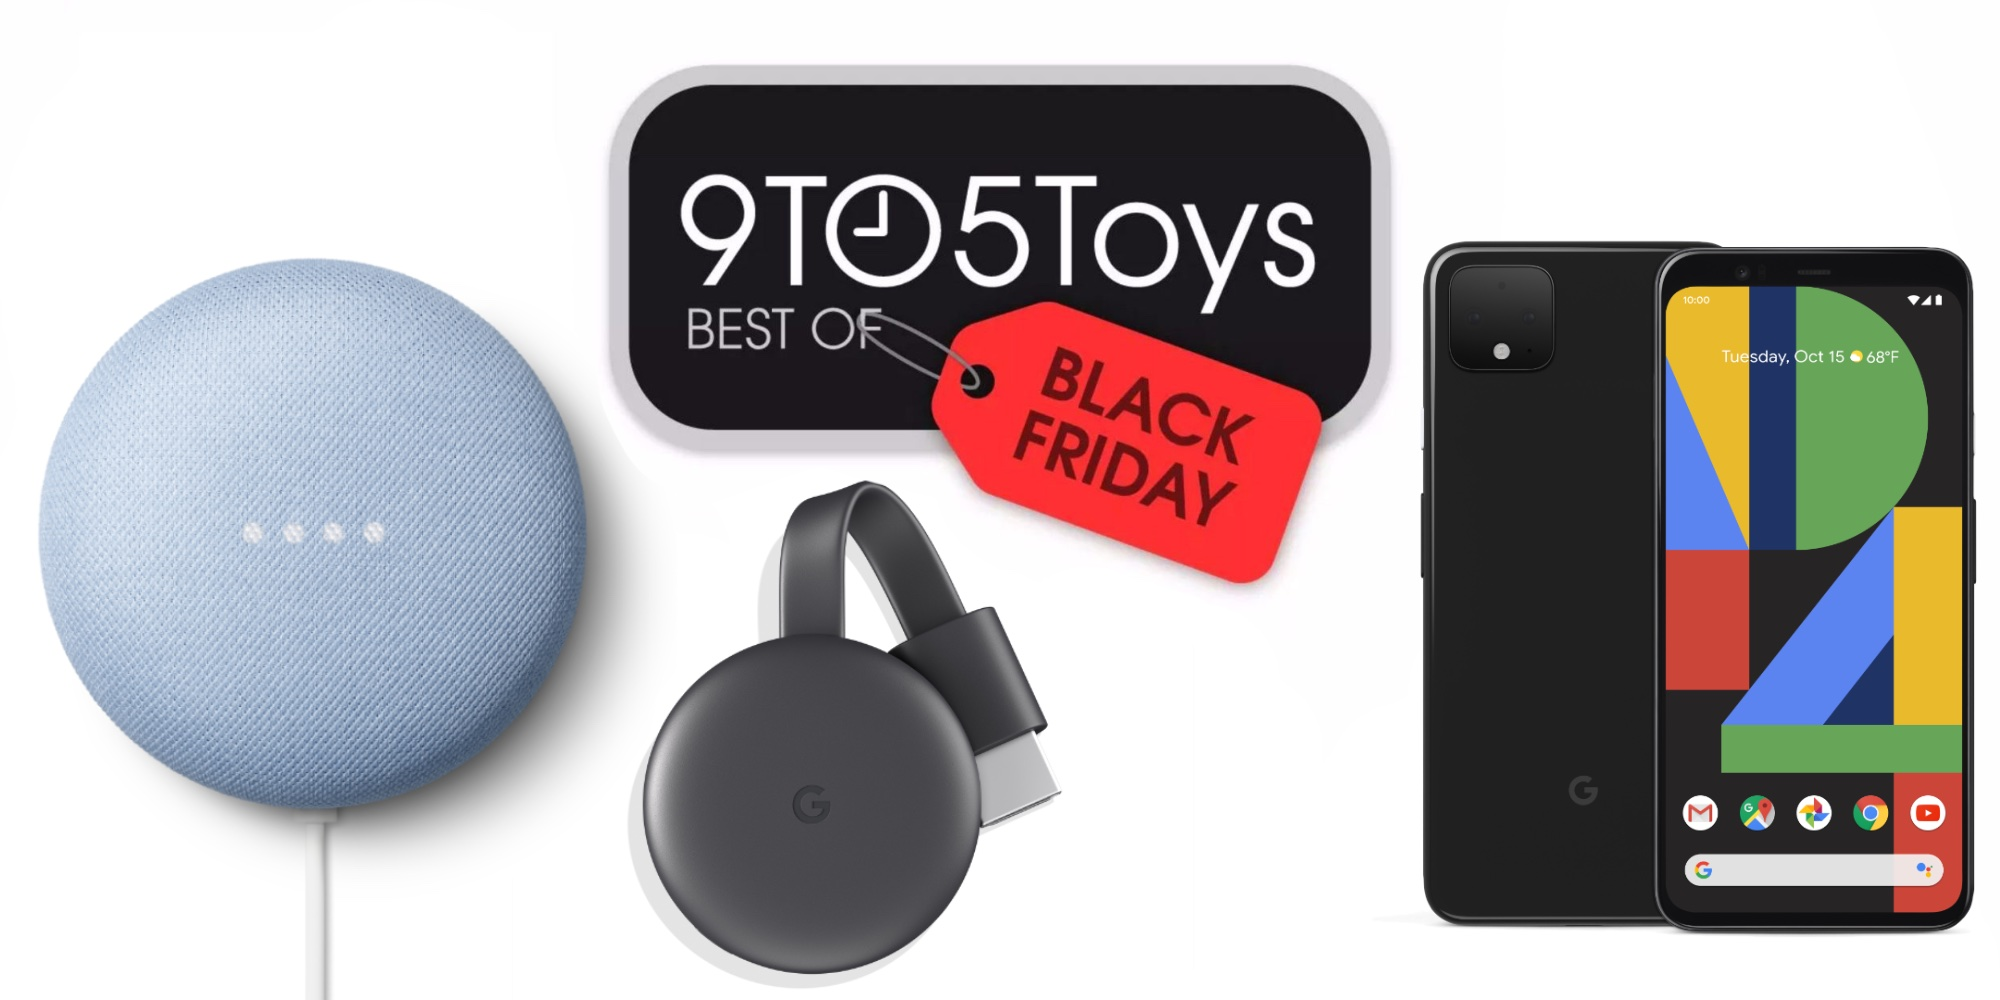 Best Google Black Friday Deals Home Mini Chromecast More 9to5toys